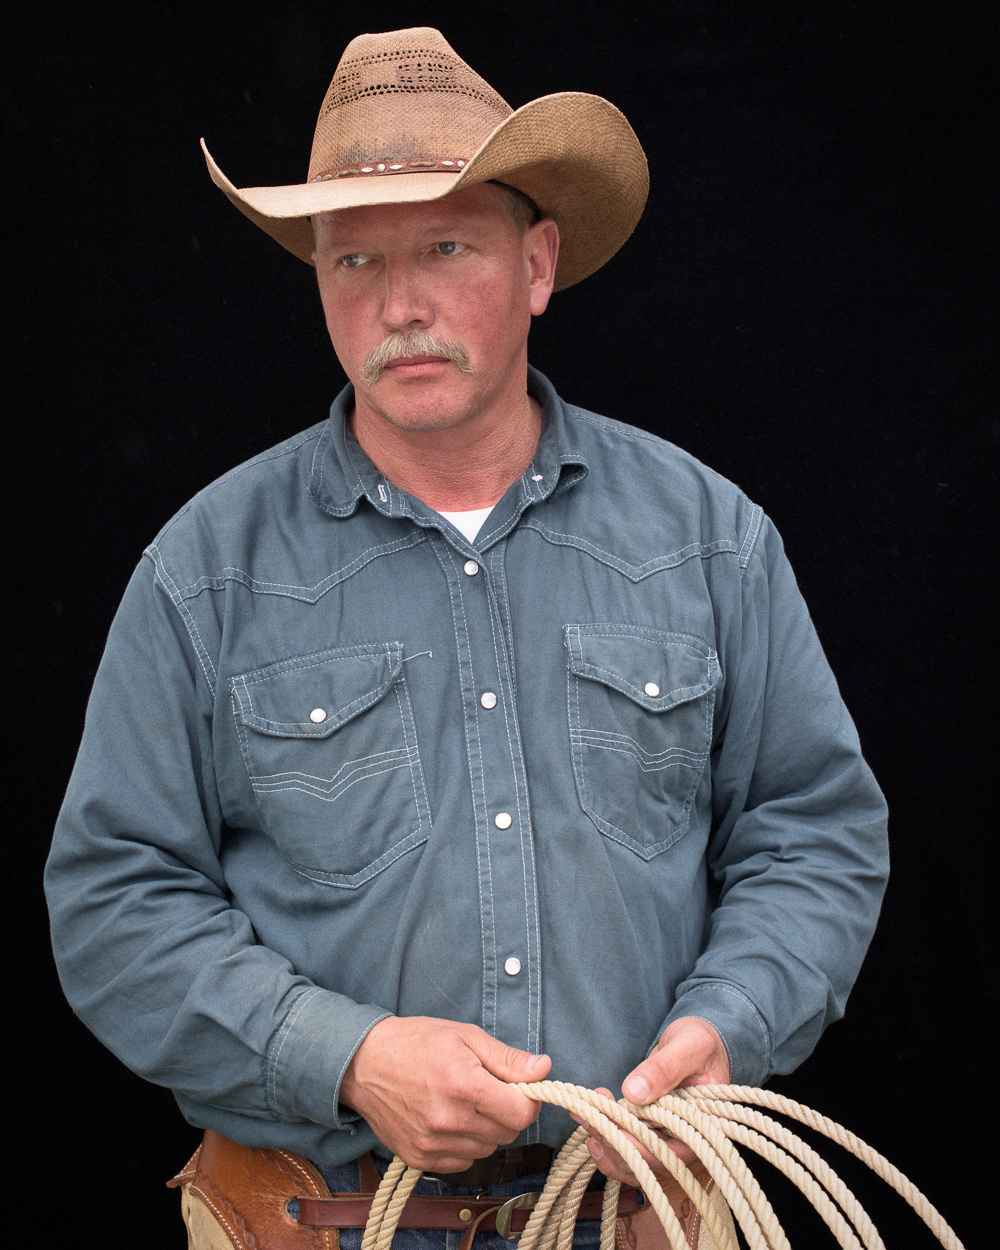 cowboys-9238-Edit.jpg